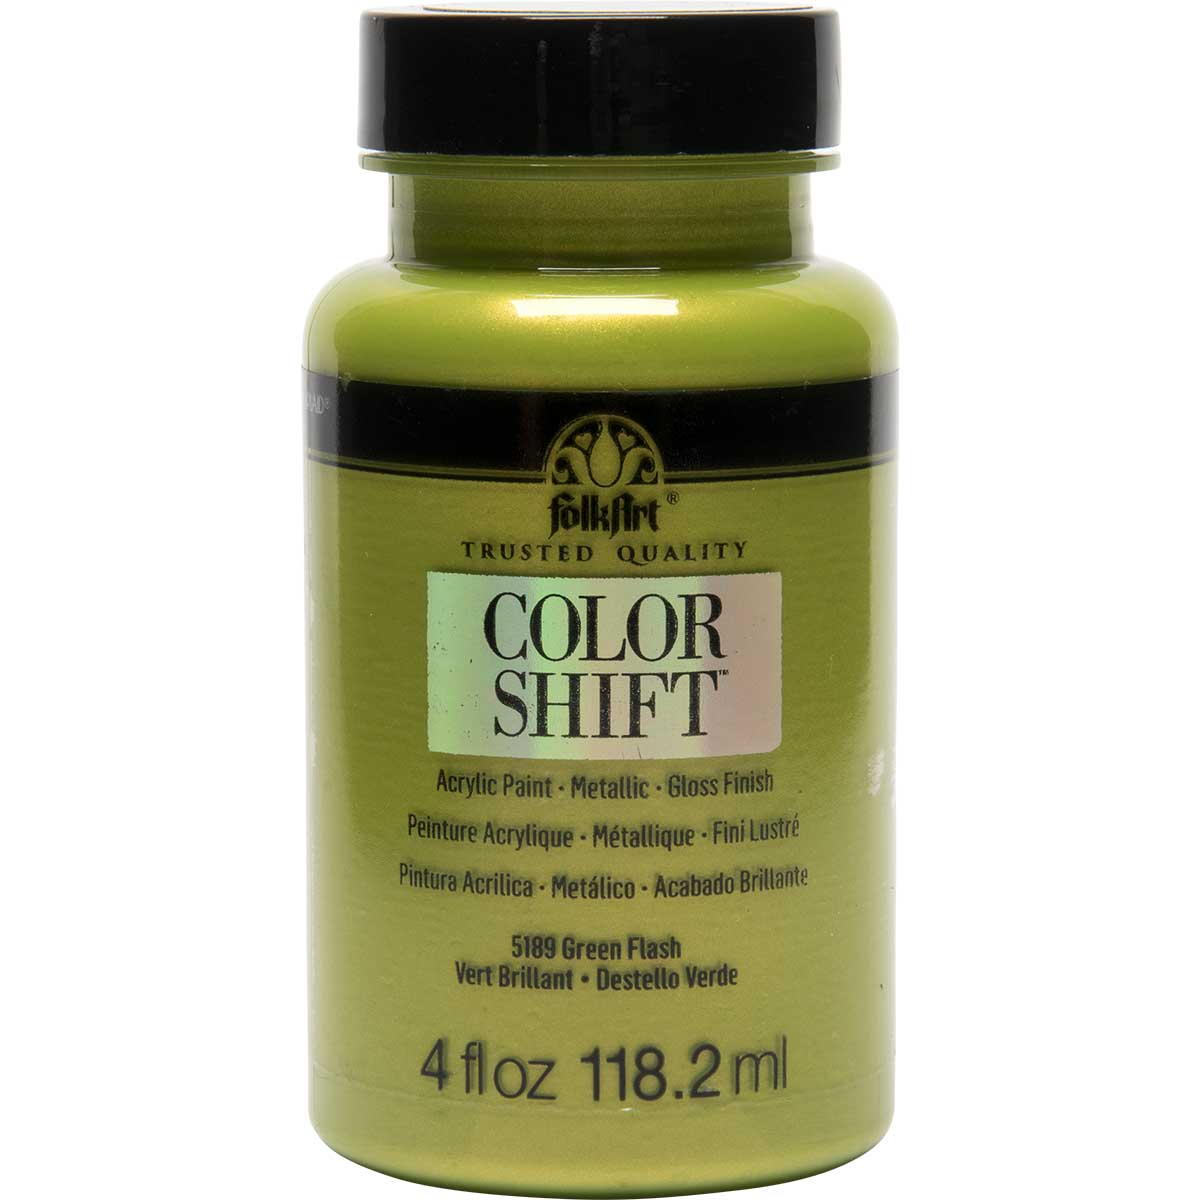 FolkArt ® Color Shift™ Acrylic Paint - Green Flash, 4 oz. - 5189